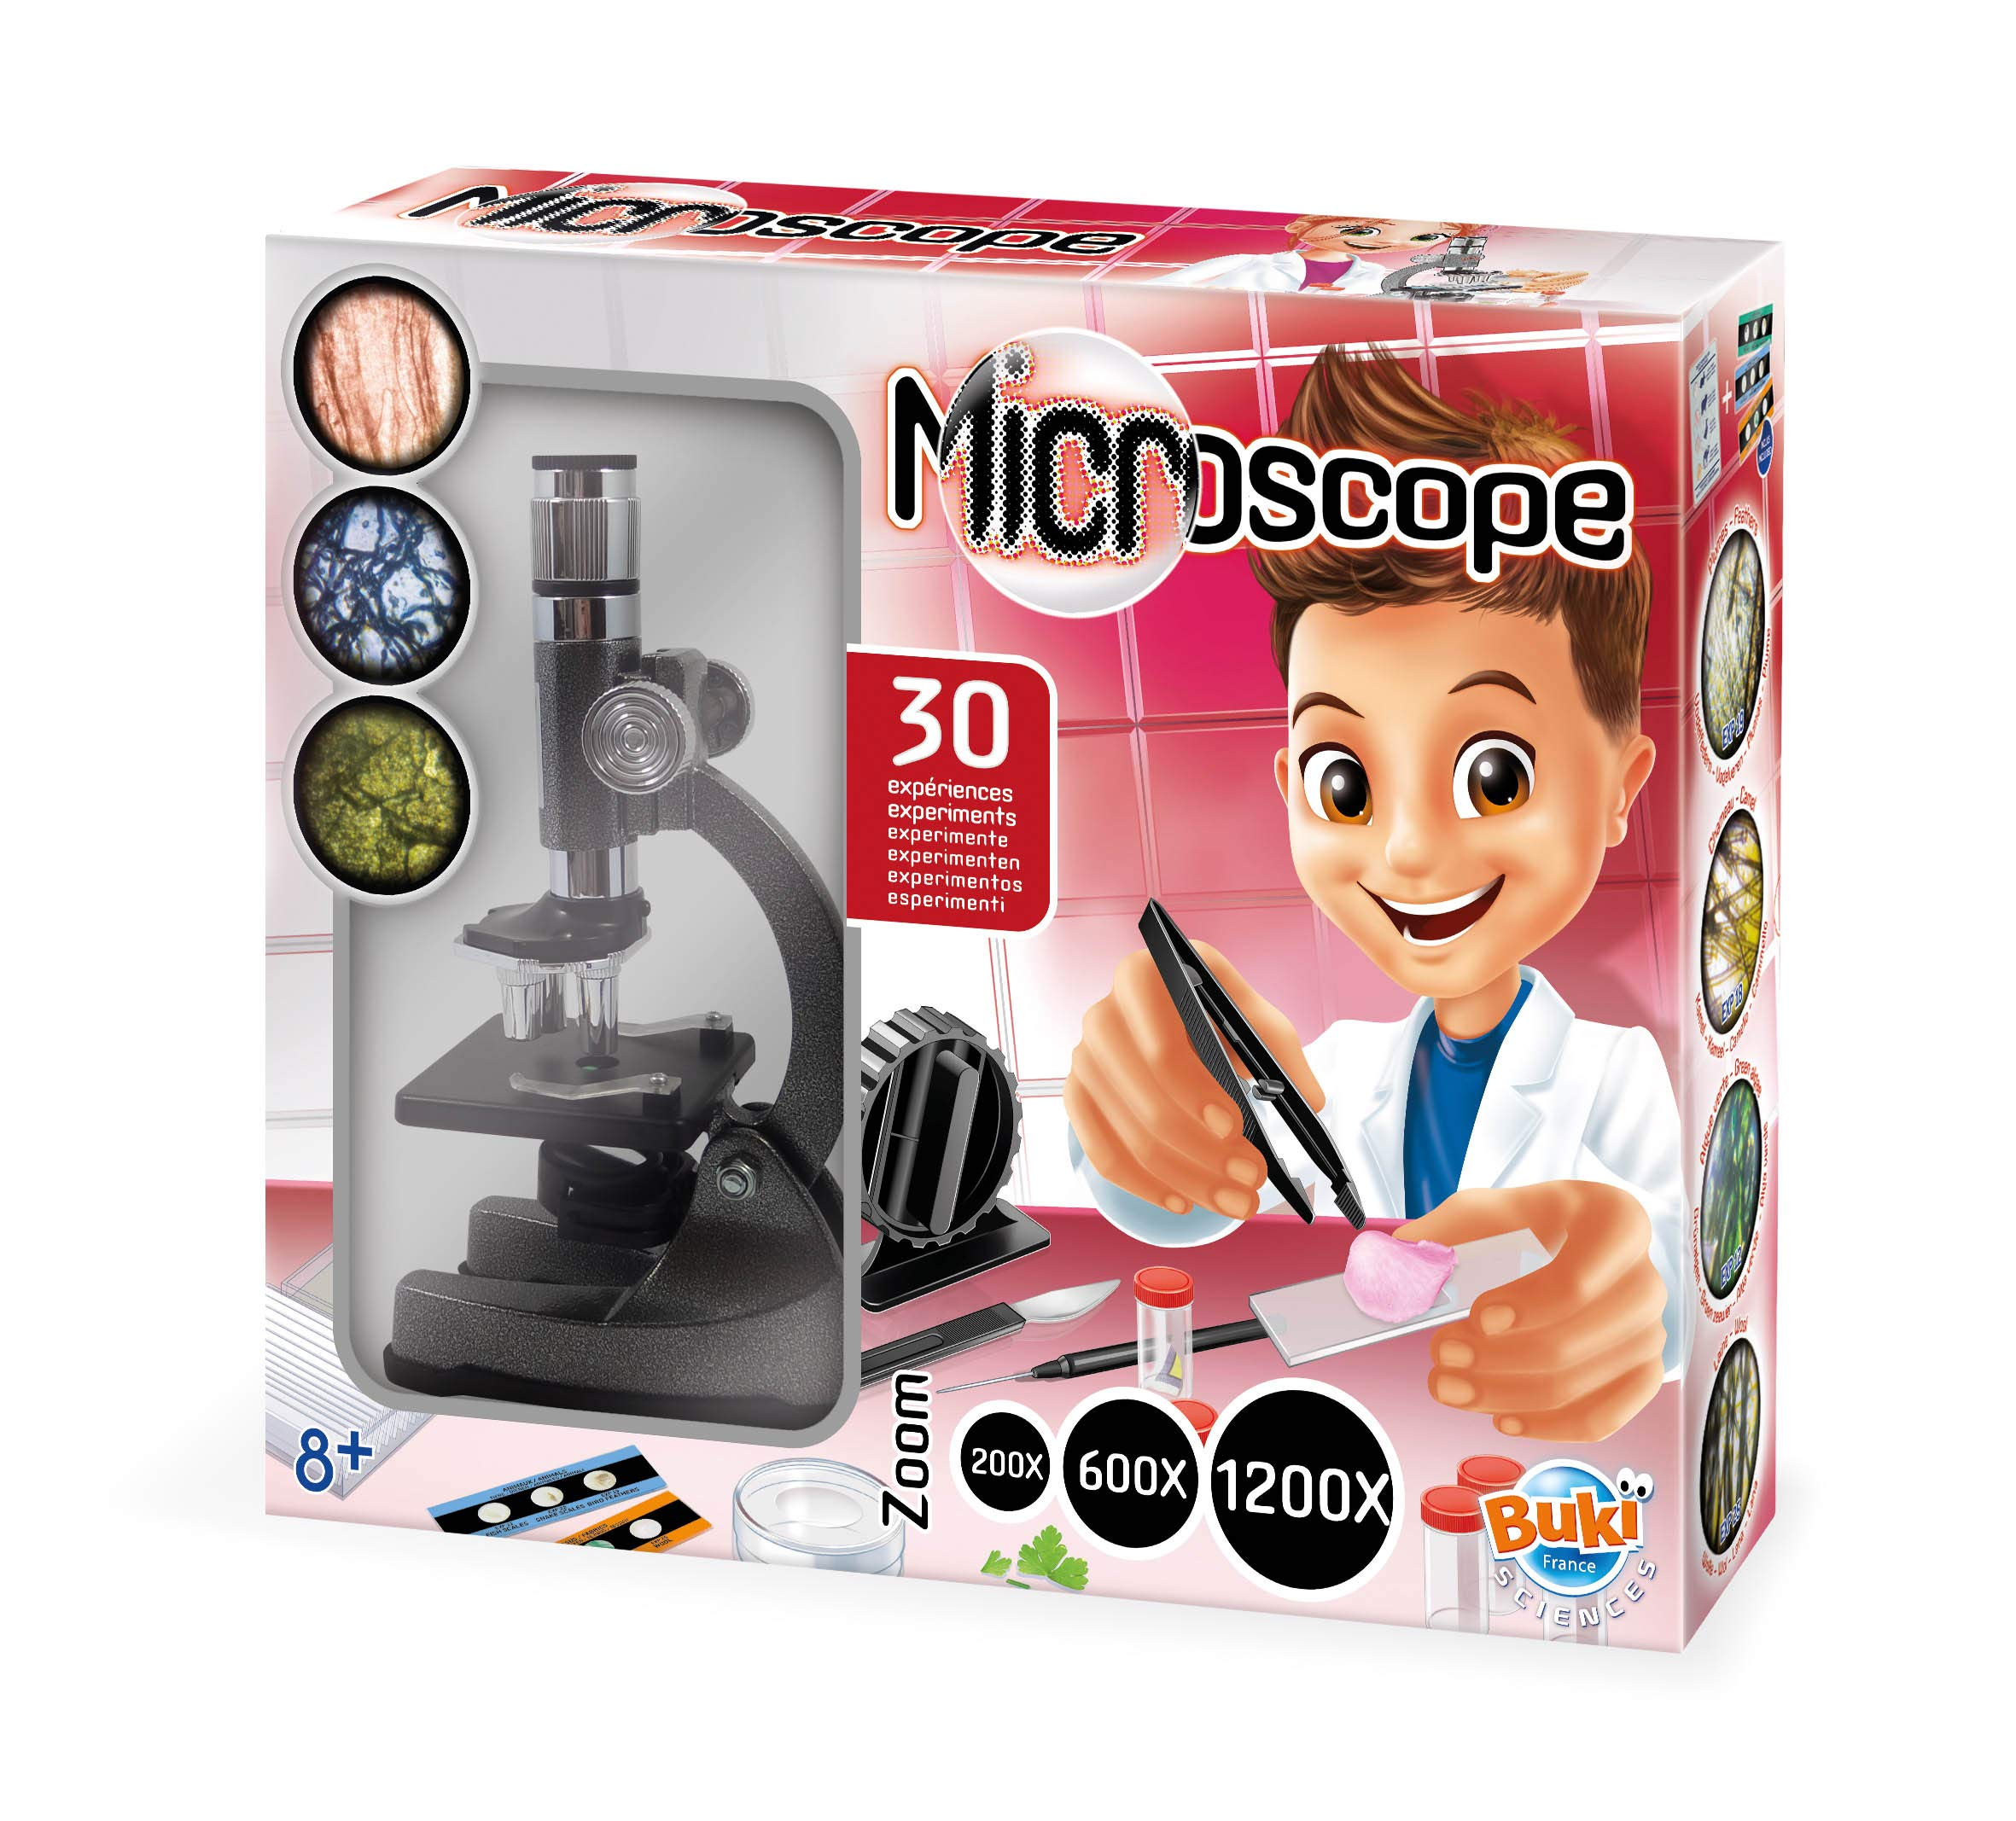 Buki France MS907B – Microscopio 30 Experimentos